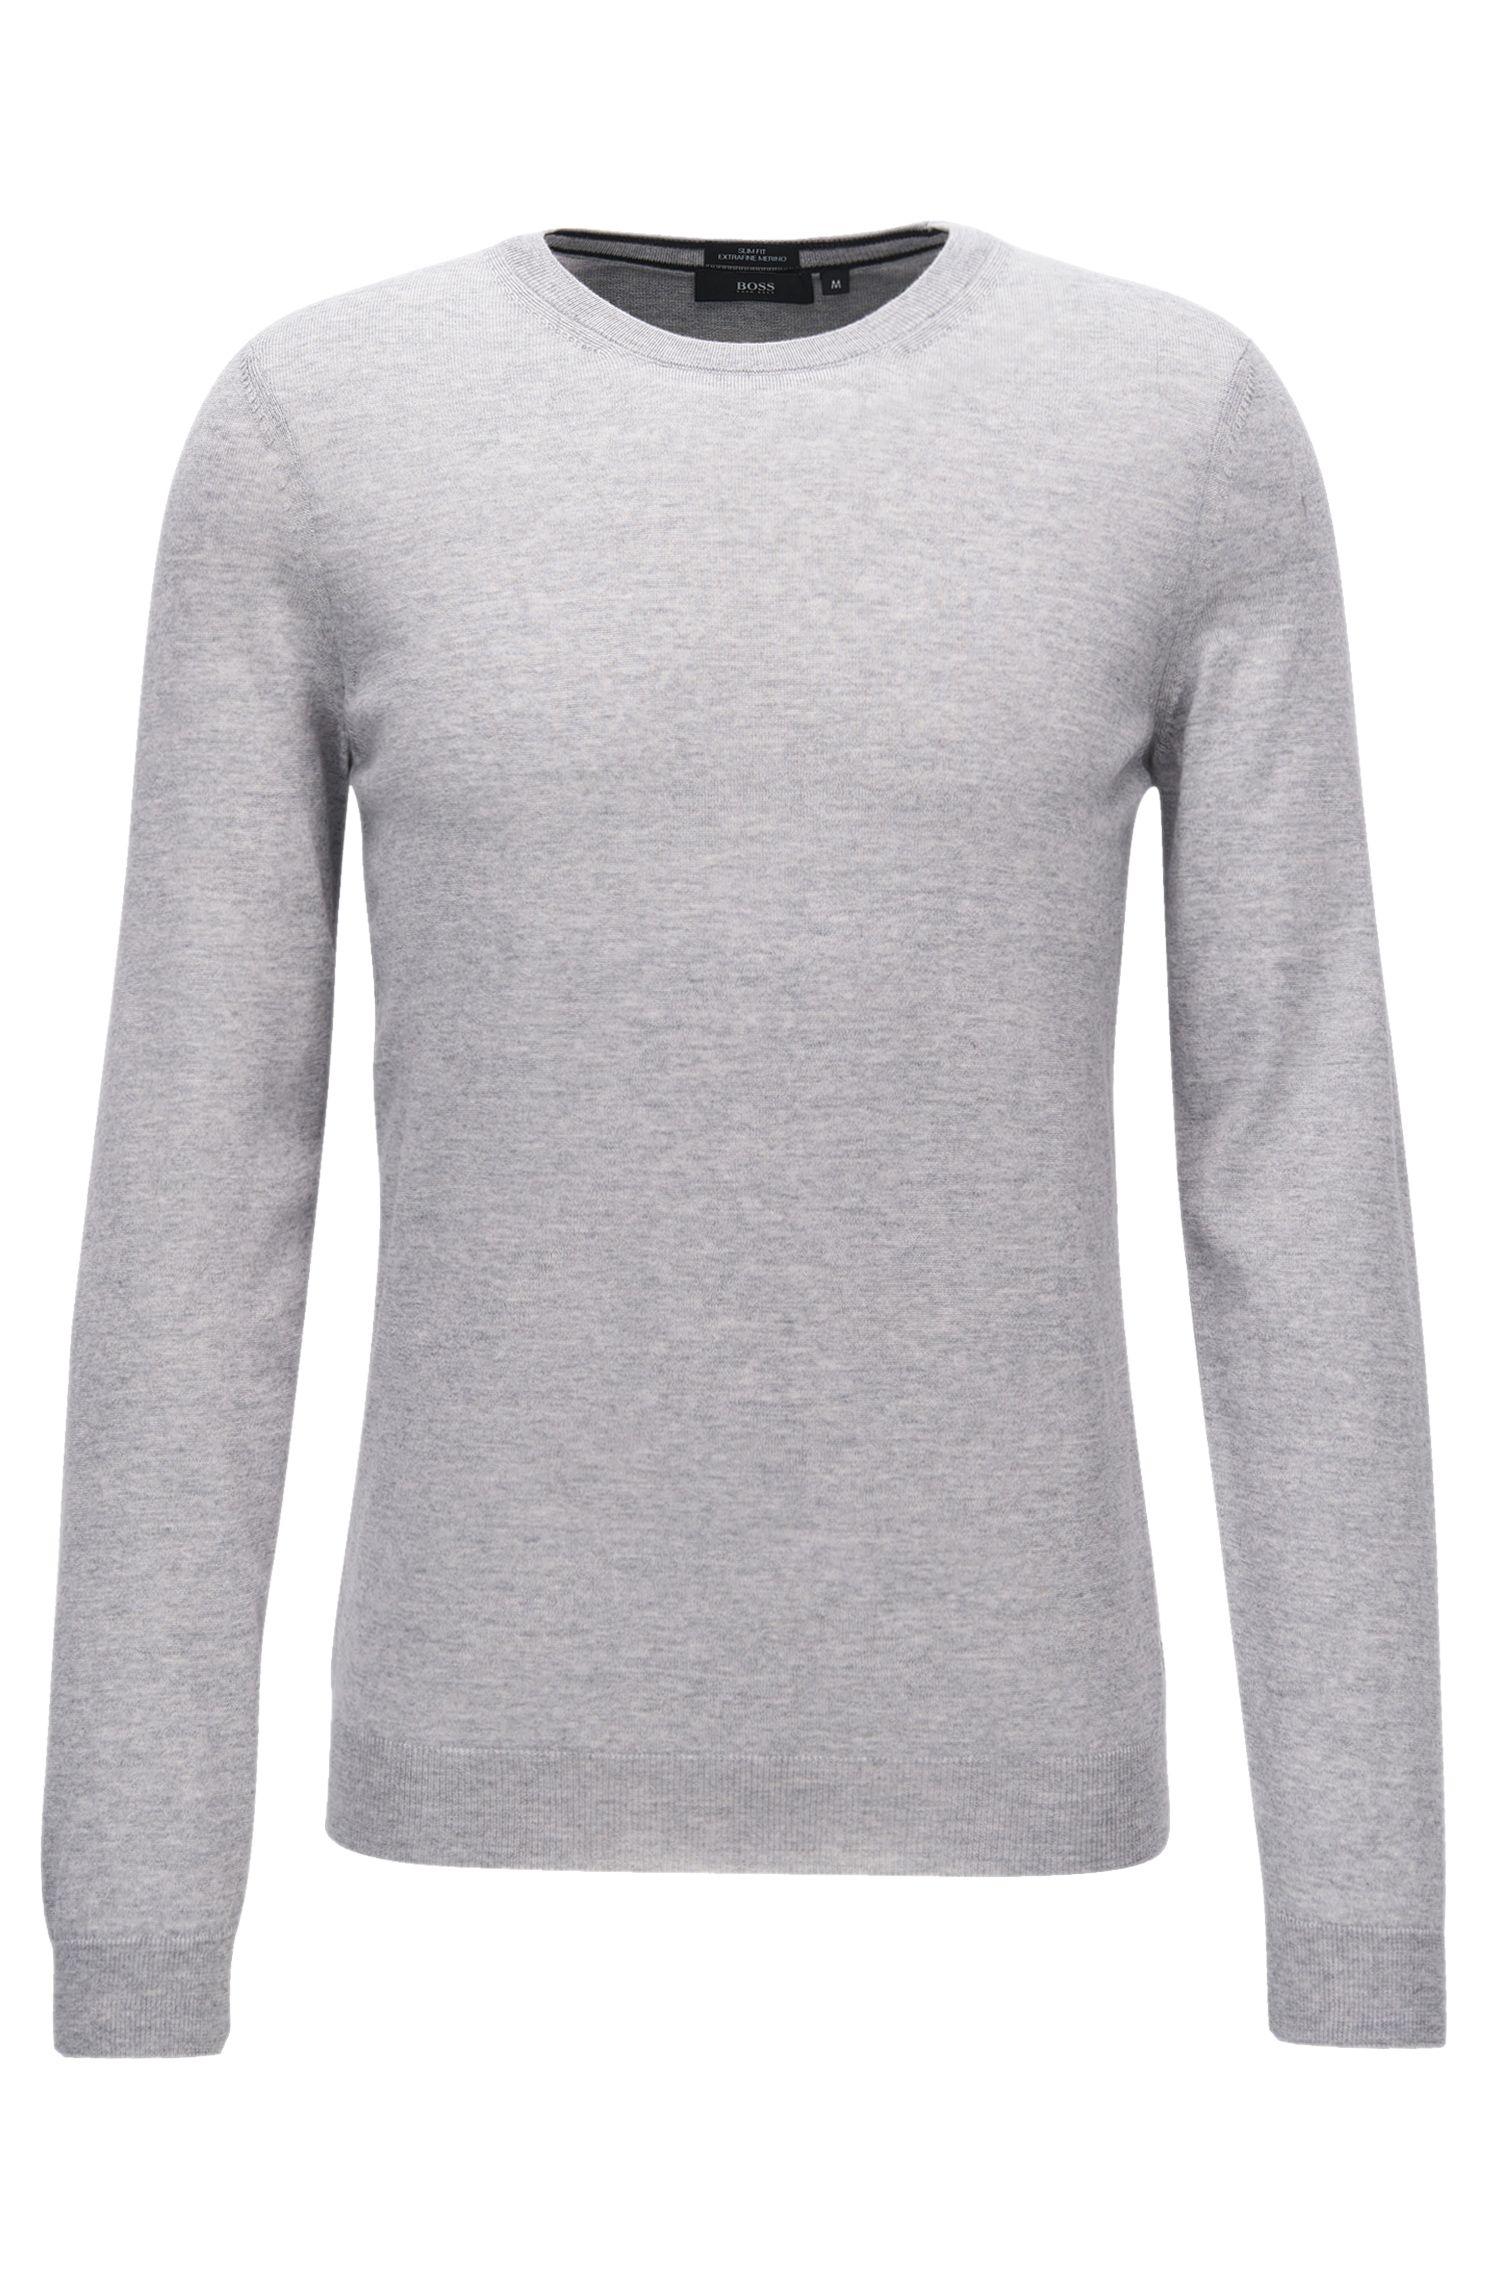 Slim-fit sweater in pure merino wool